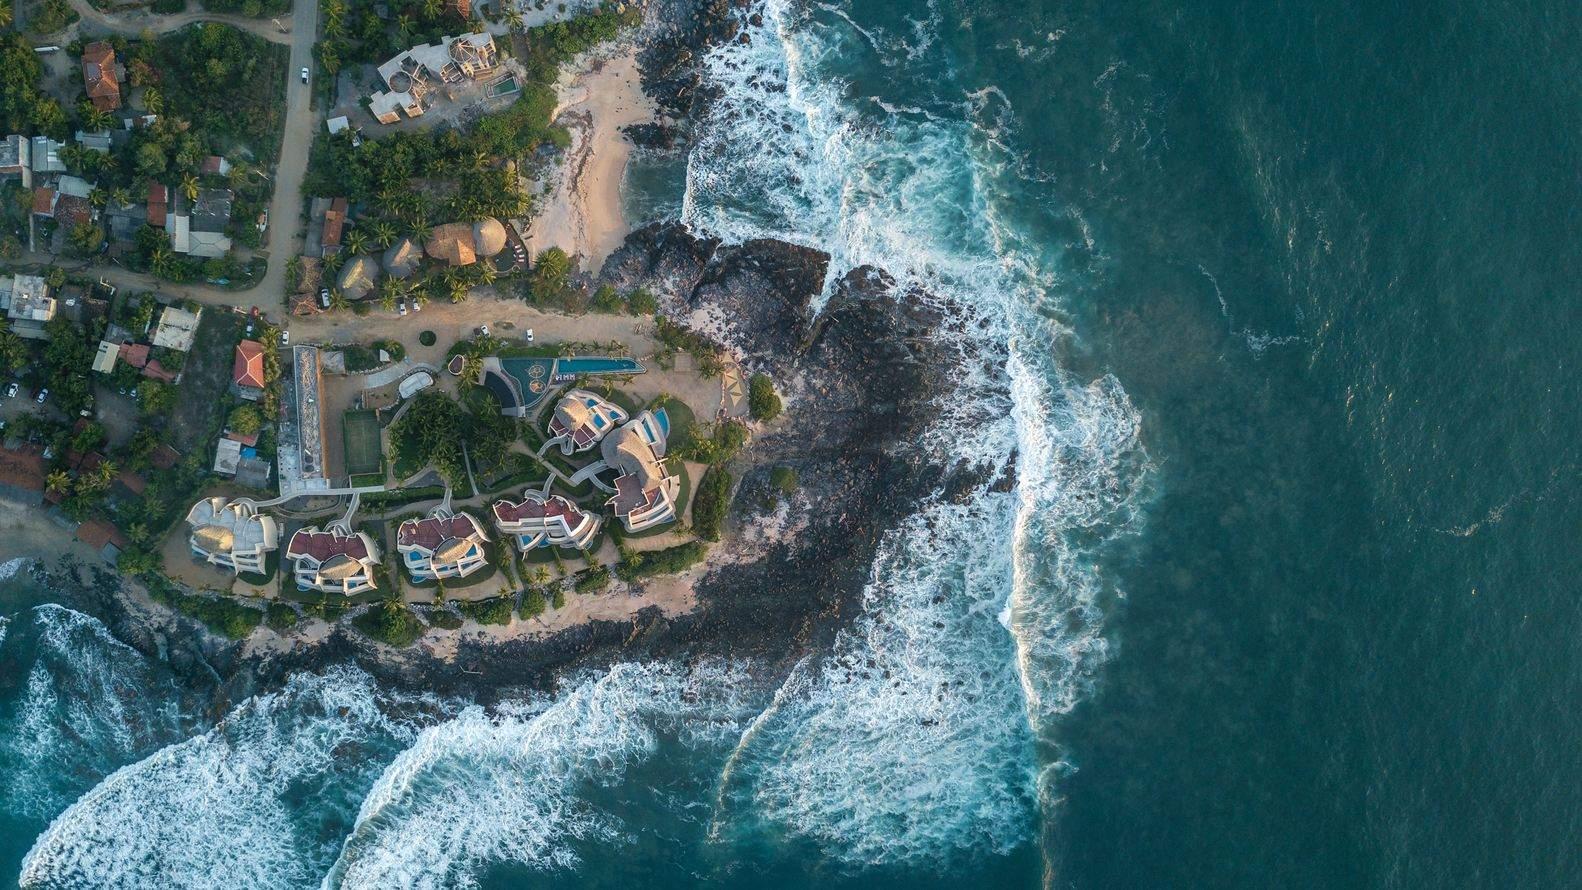 Комплекс оточений садом та океаном / Фото Archdaily